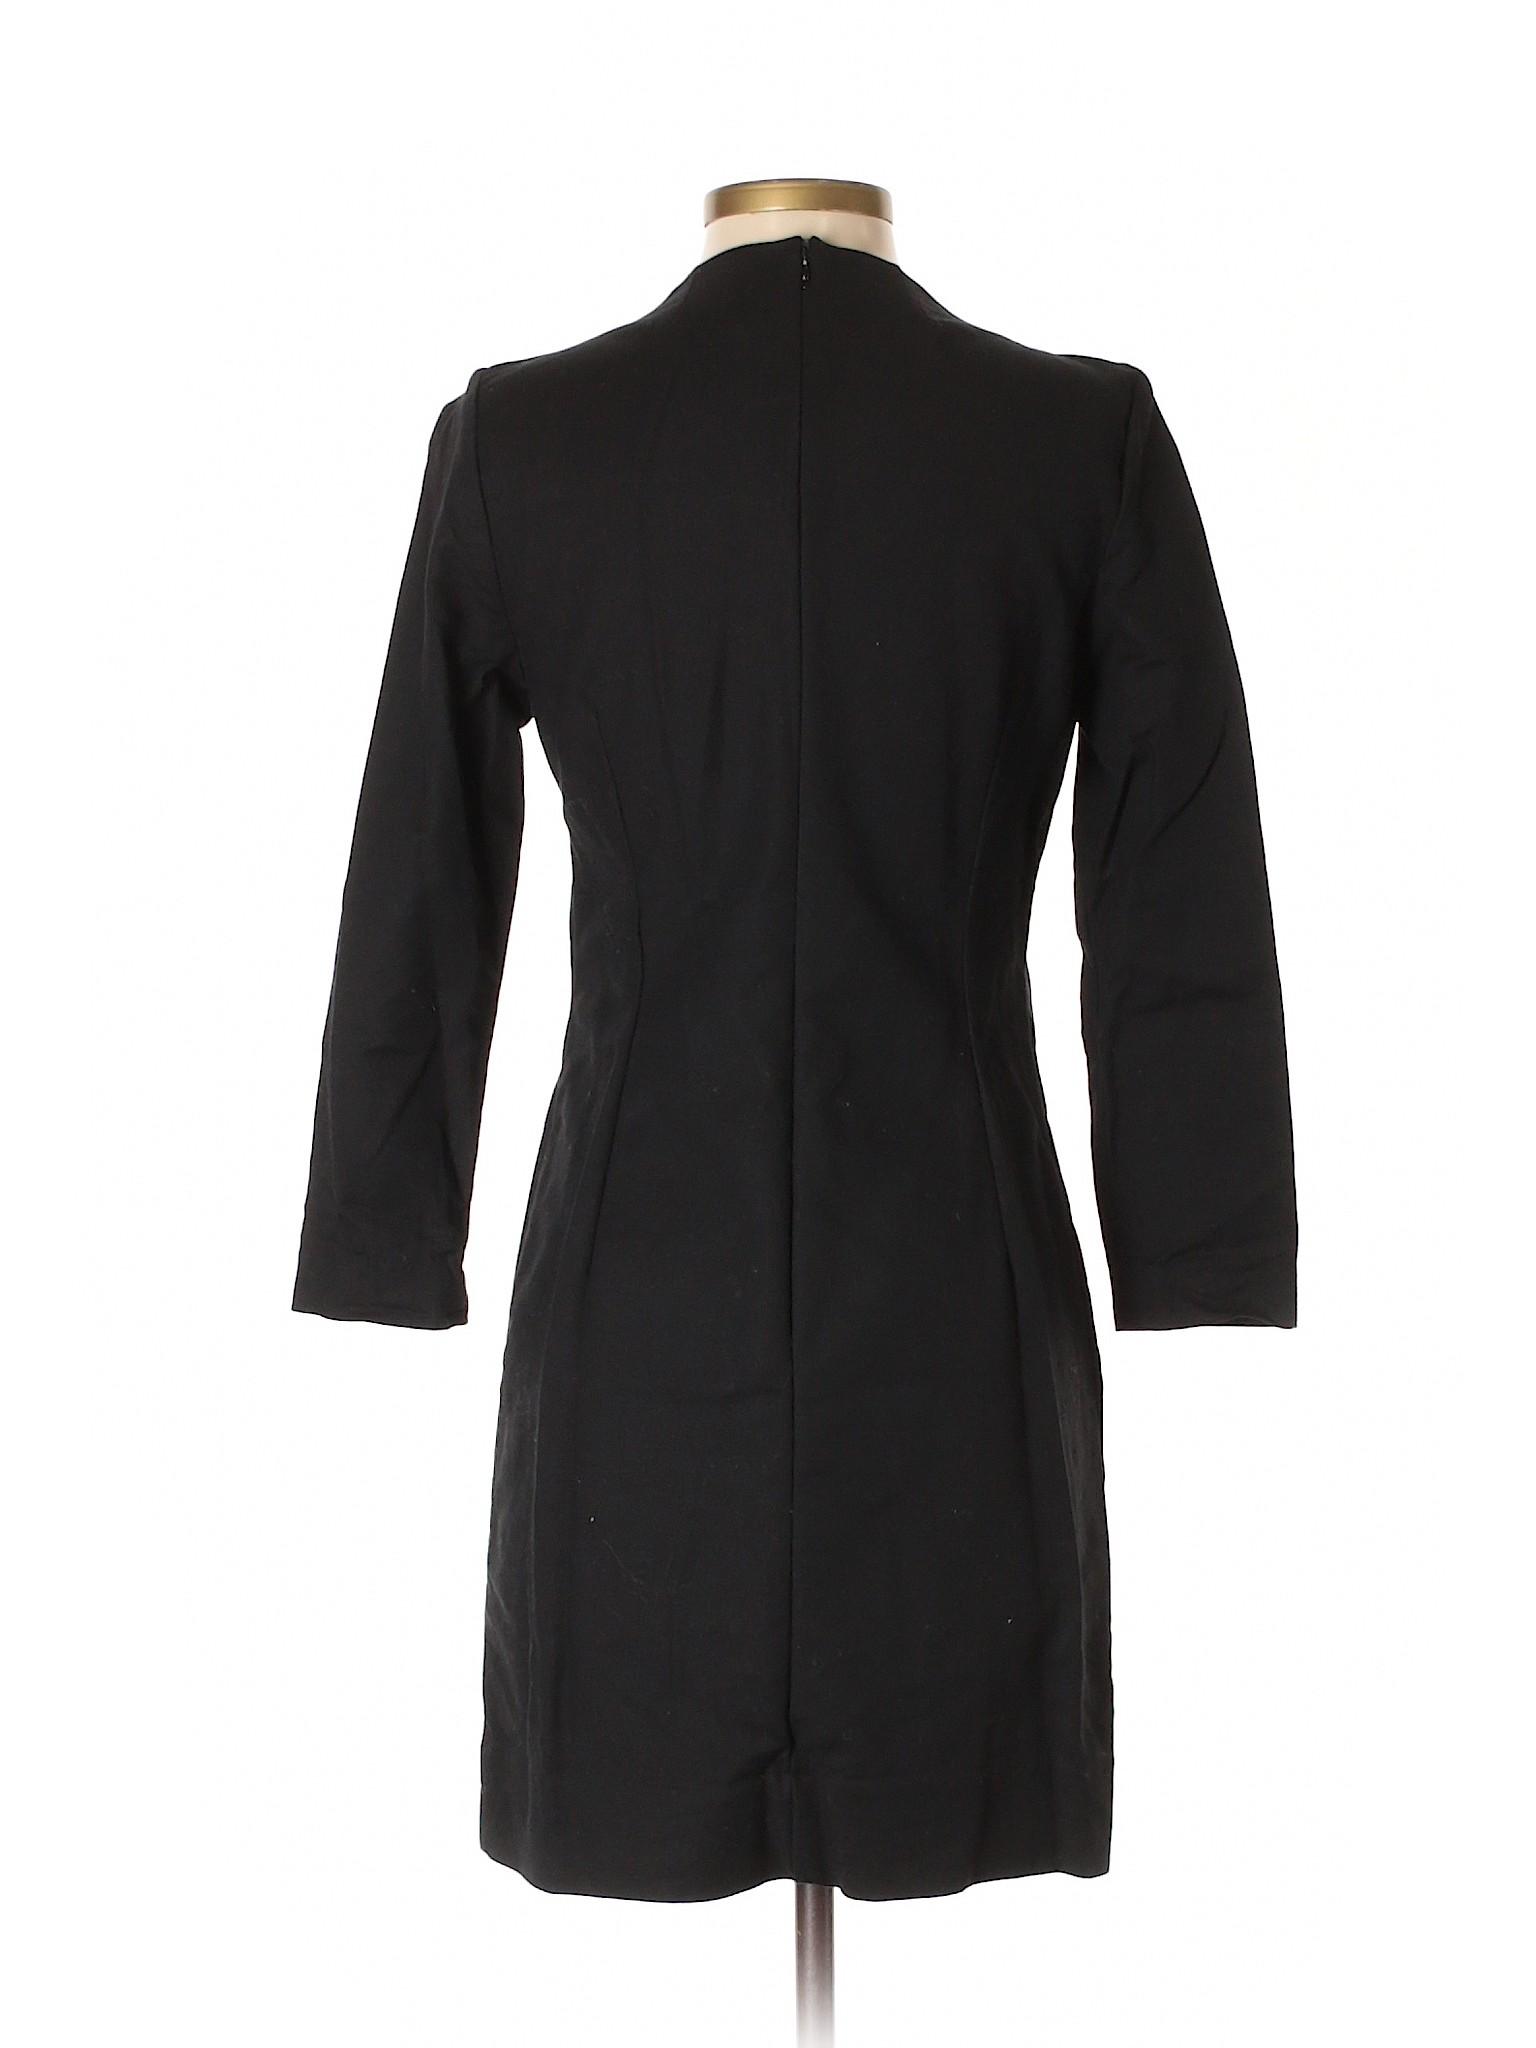 Gap Casual Gap Casual Boutique Dress Boutique winter winter Dress YpRCxqwFR